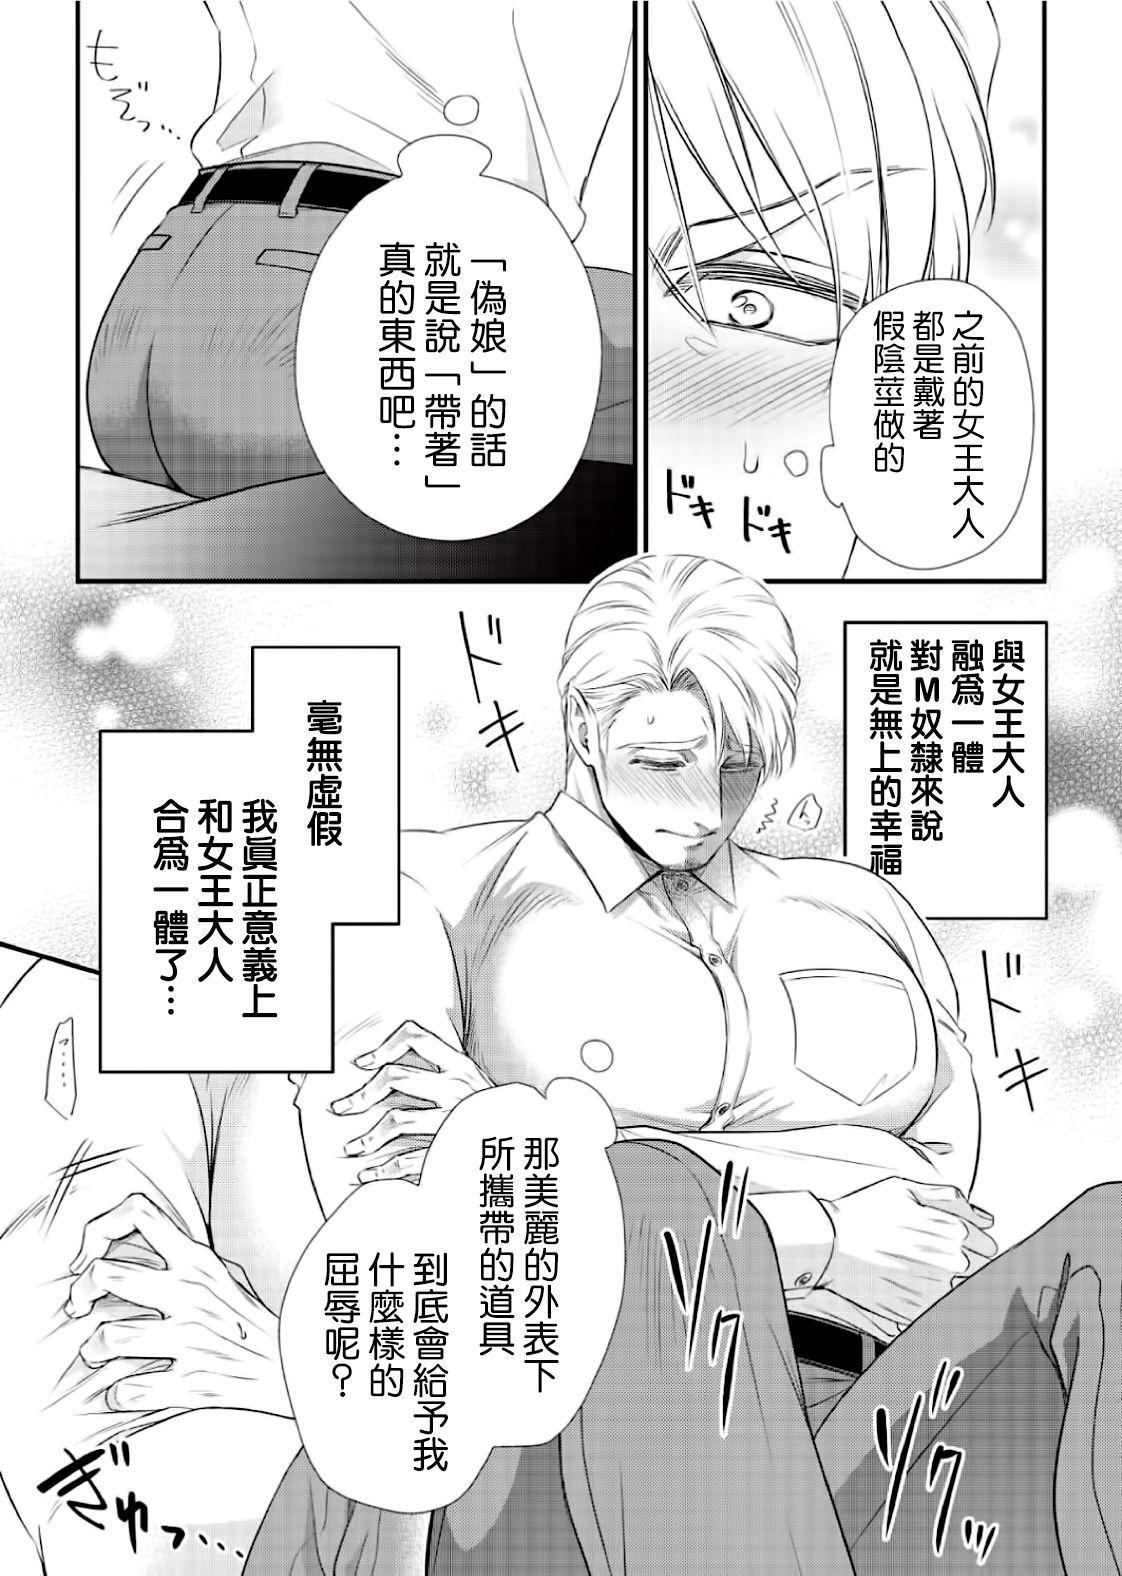 [Aion Kiu] Ijimete Kudasai Omega-sama ch.1-2 [Chinese] [沒有漢化] [Digital] 13